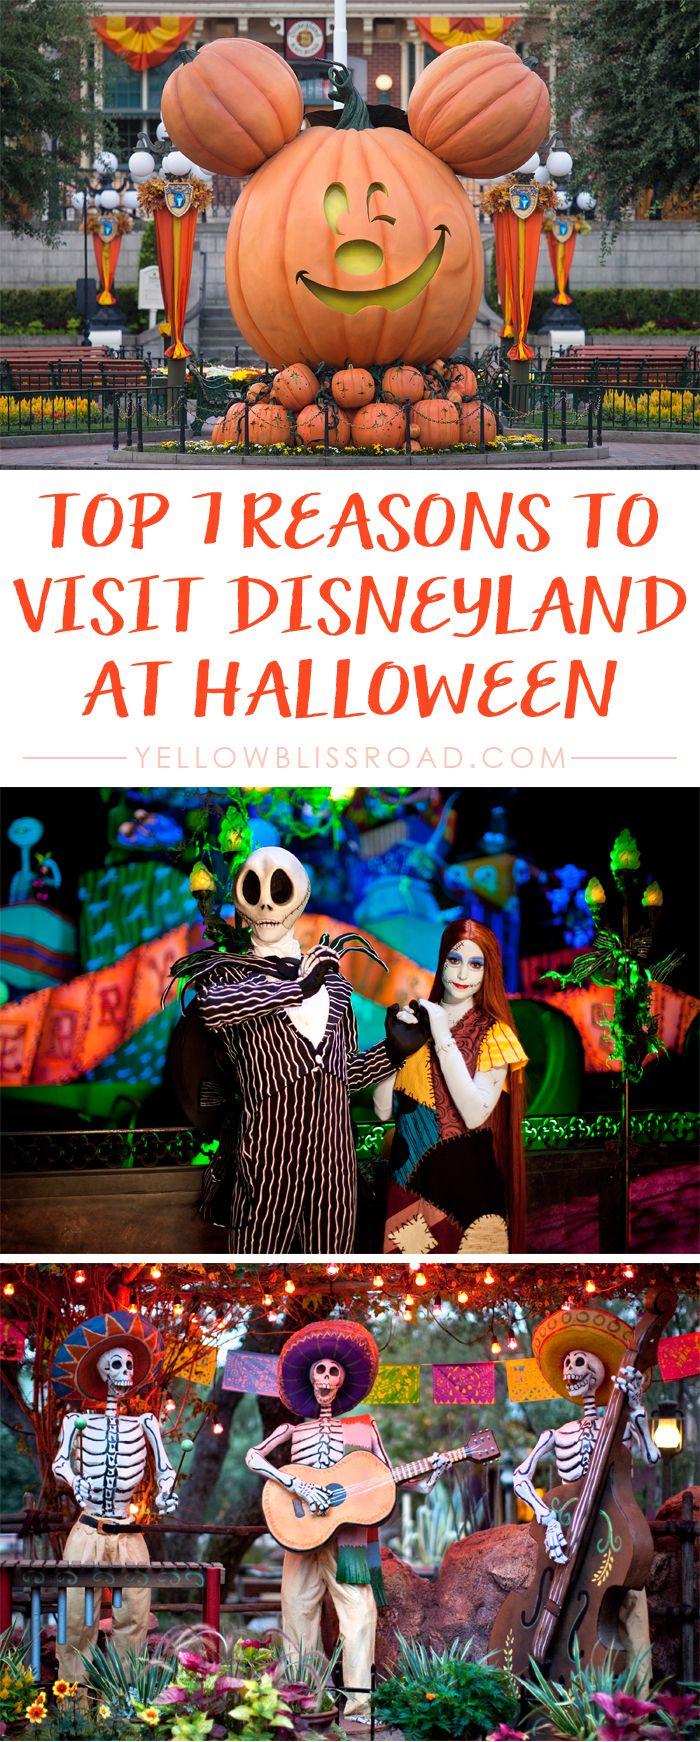 Top 7 Reasons to Visit Disneyland at Halloween